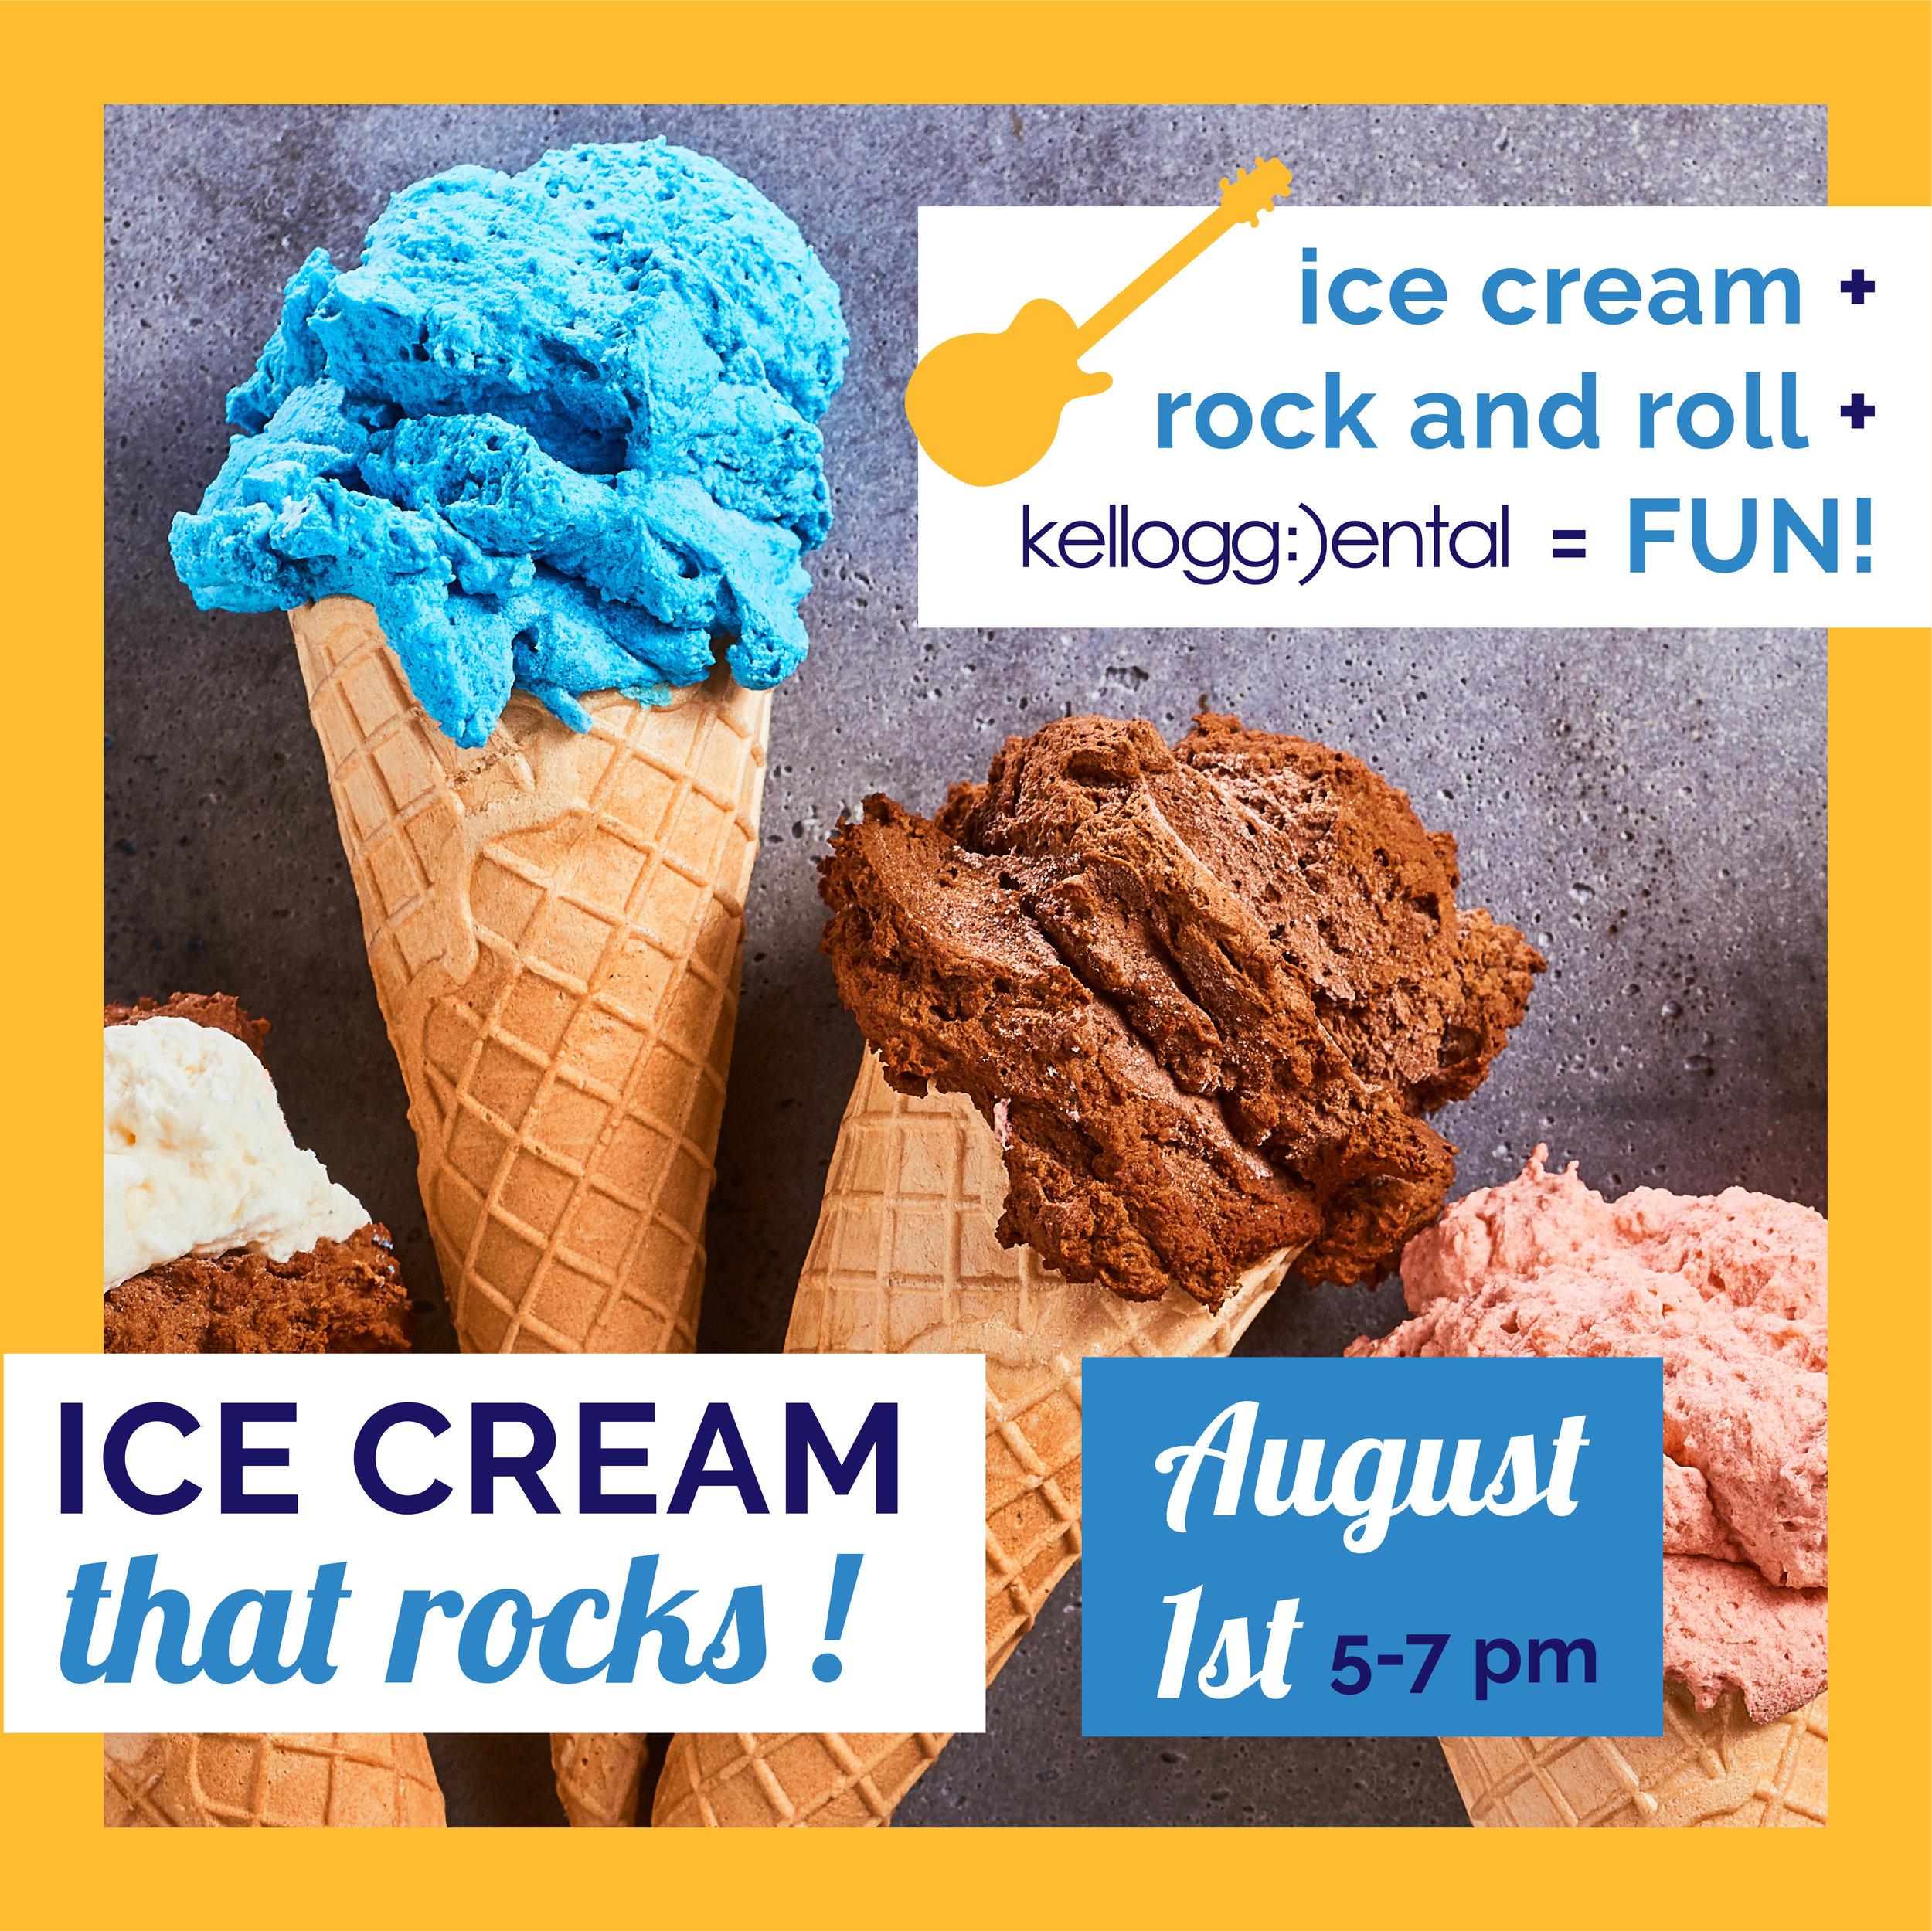 Ice Cream Promotion Posts-02.jpg